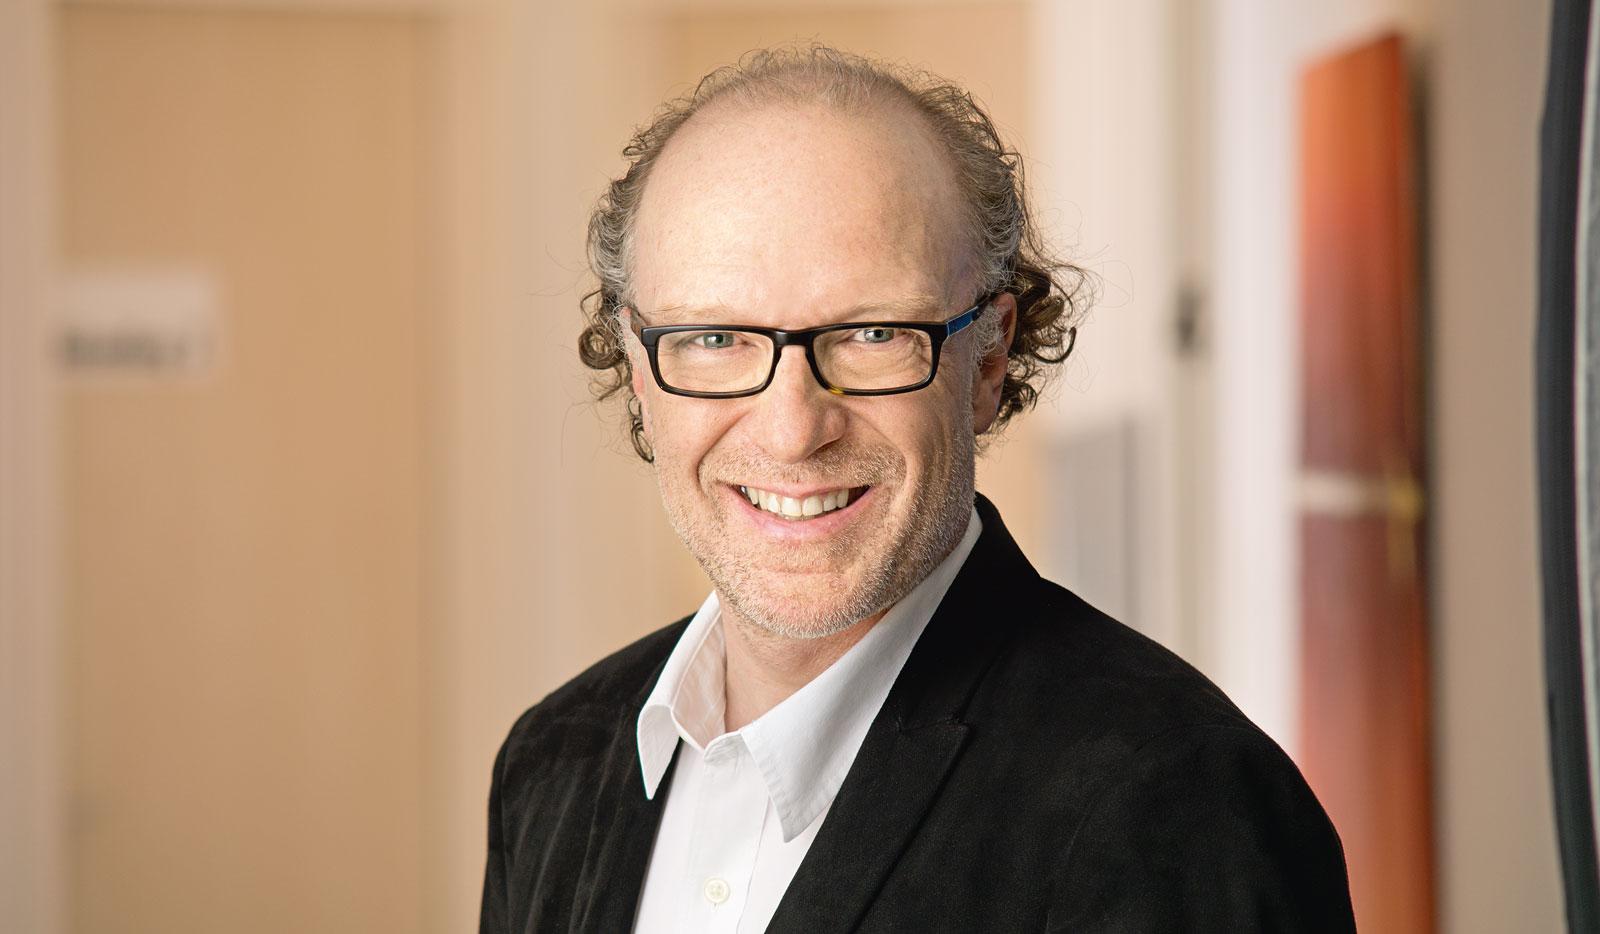 Chirurg Michael Schneiders